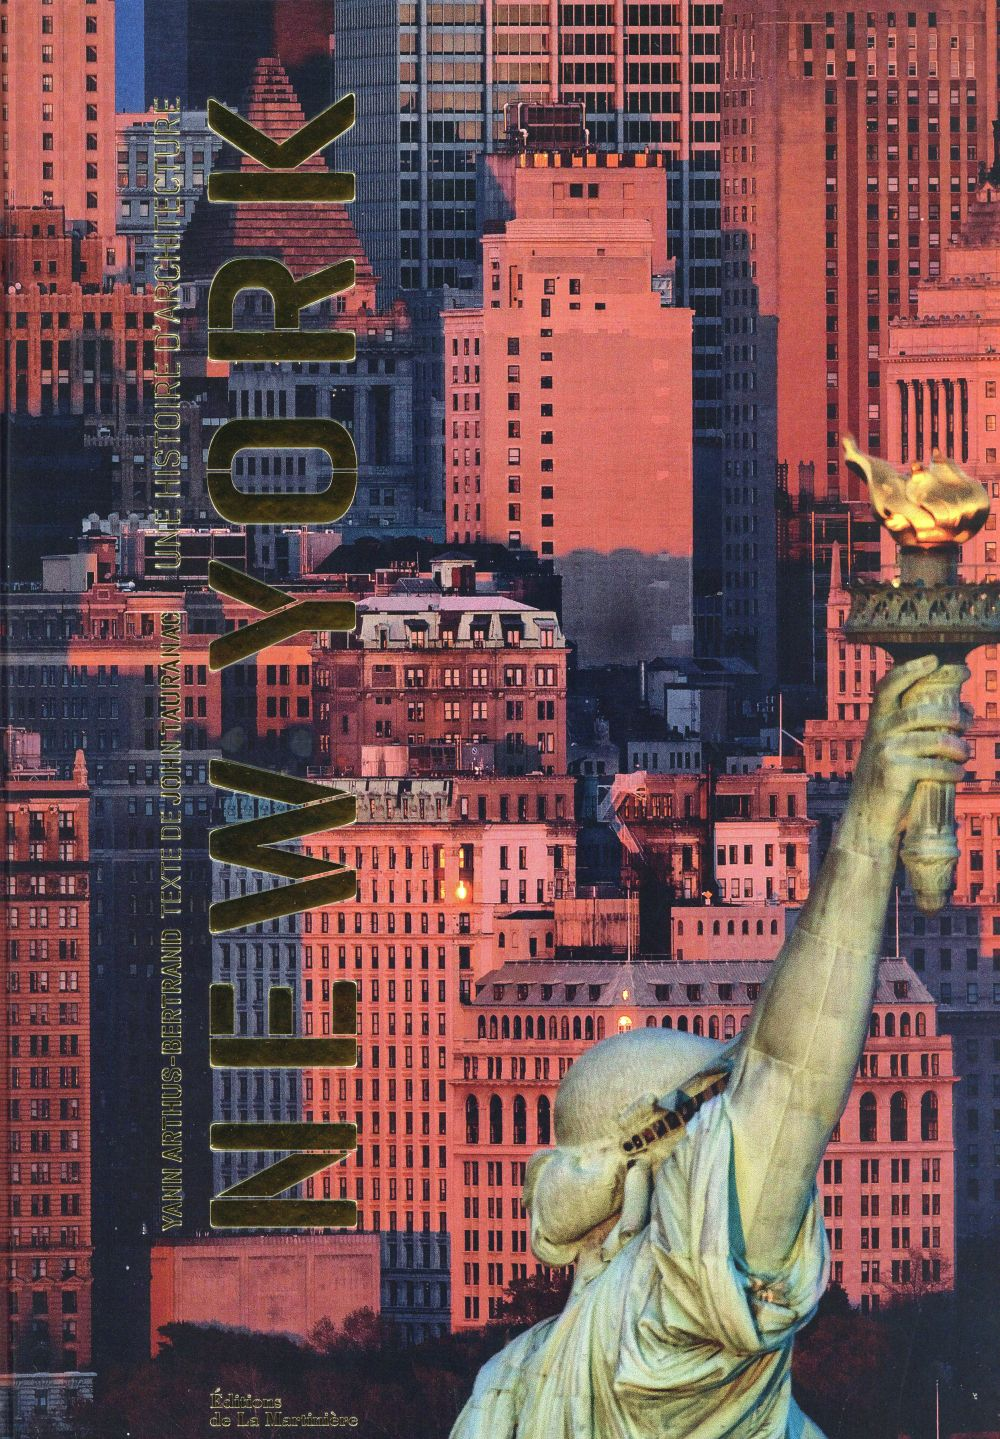 New York ; une histoire d'architecture